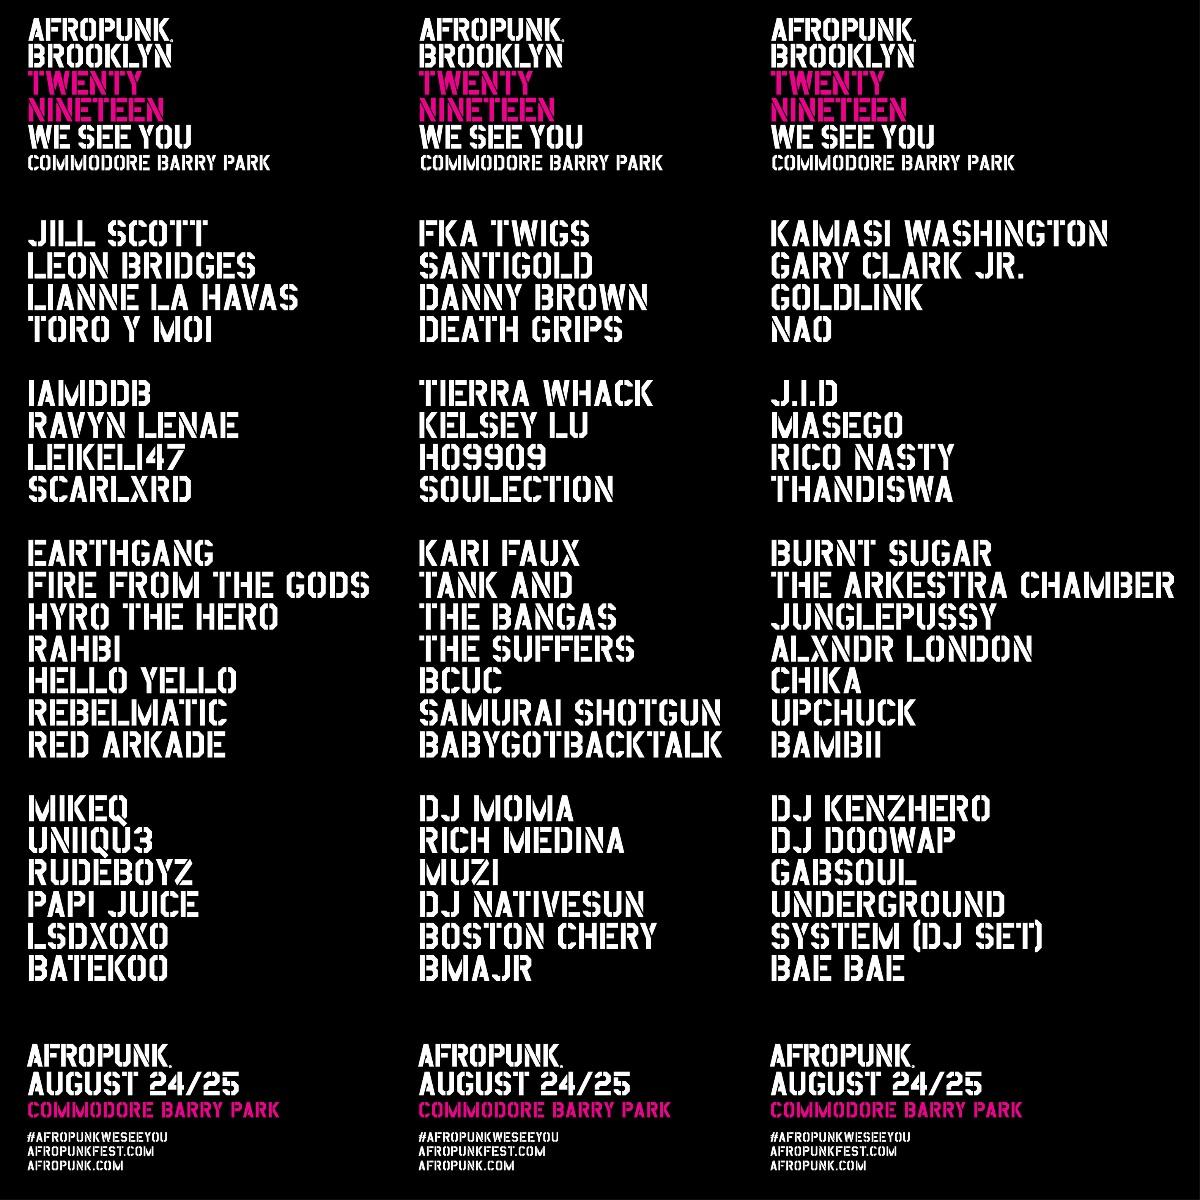 Afropunk Festival 2019 Lineup in Brooklyn